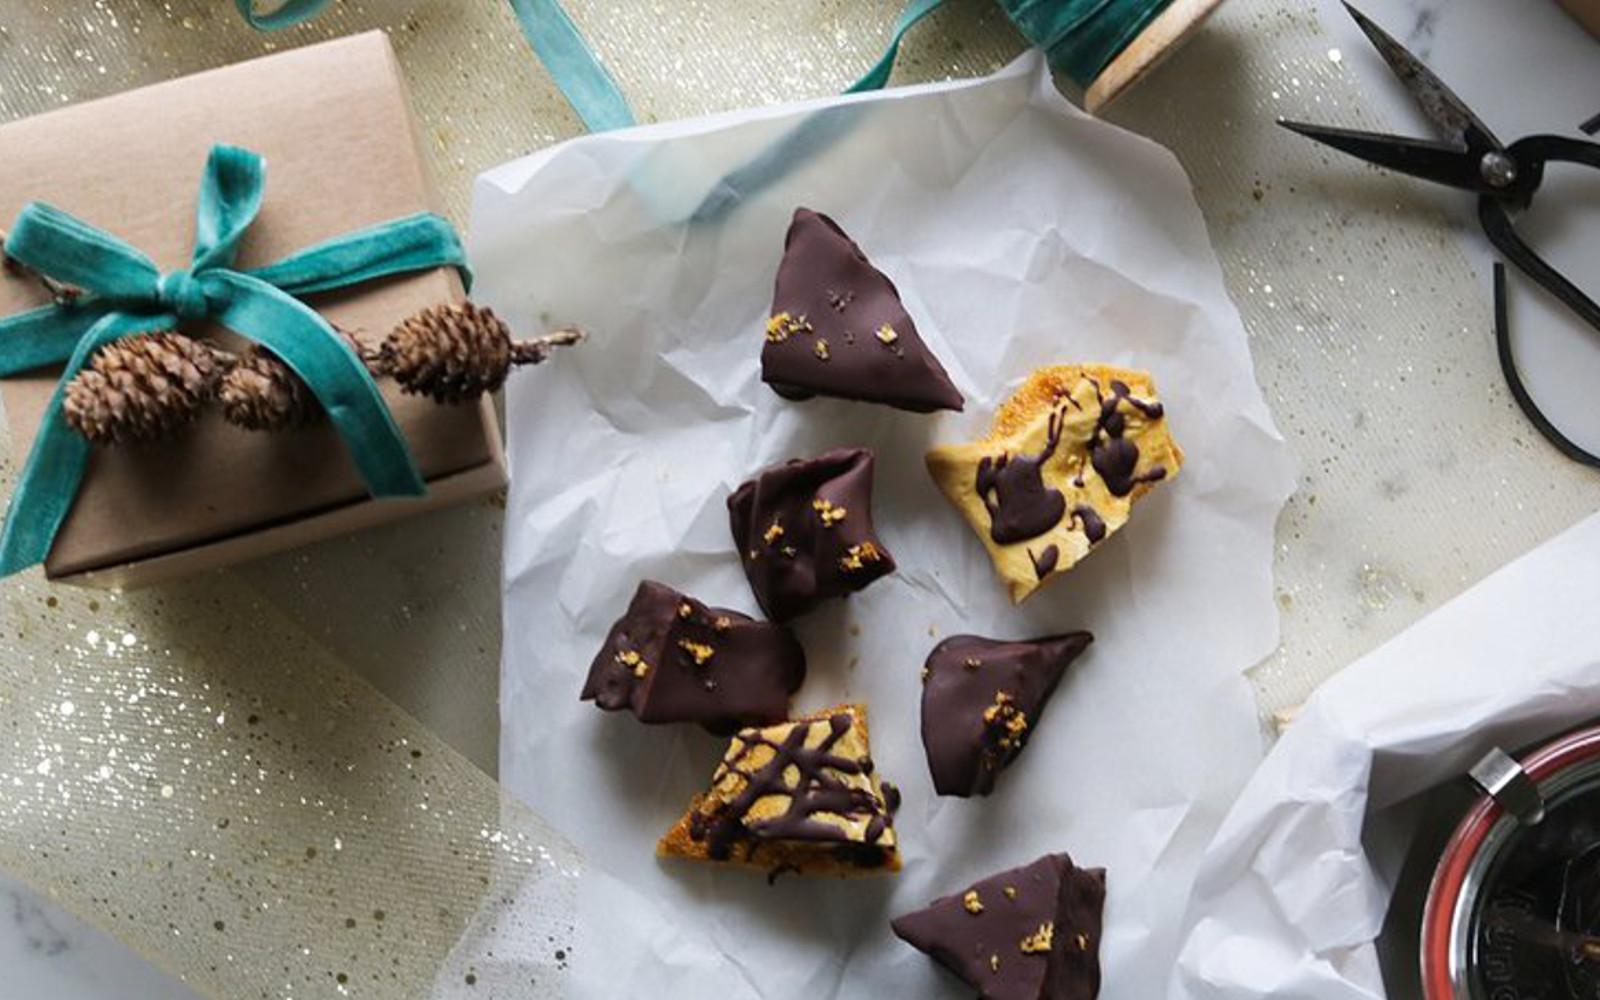 Vegan Gluten-Free Homemade Sponge Toffee with chocolate coating